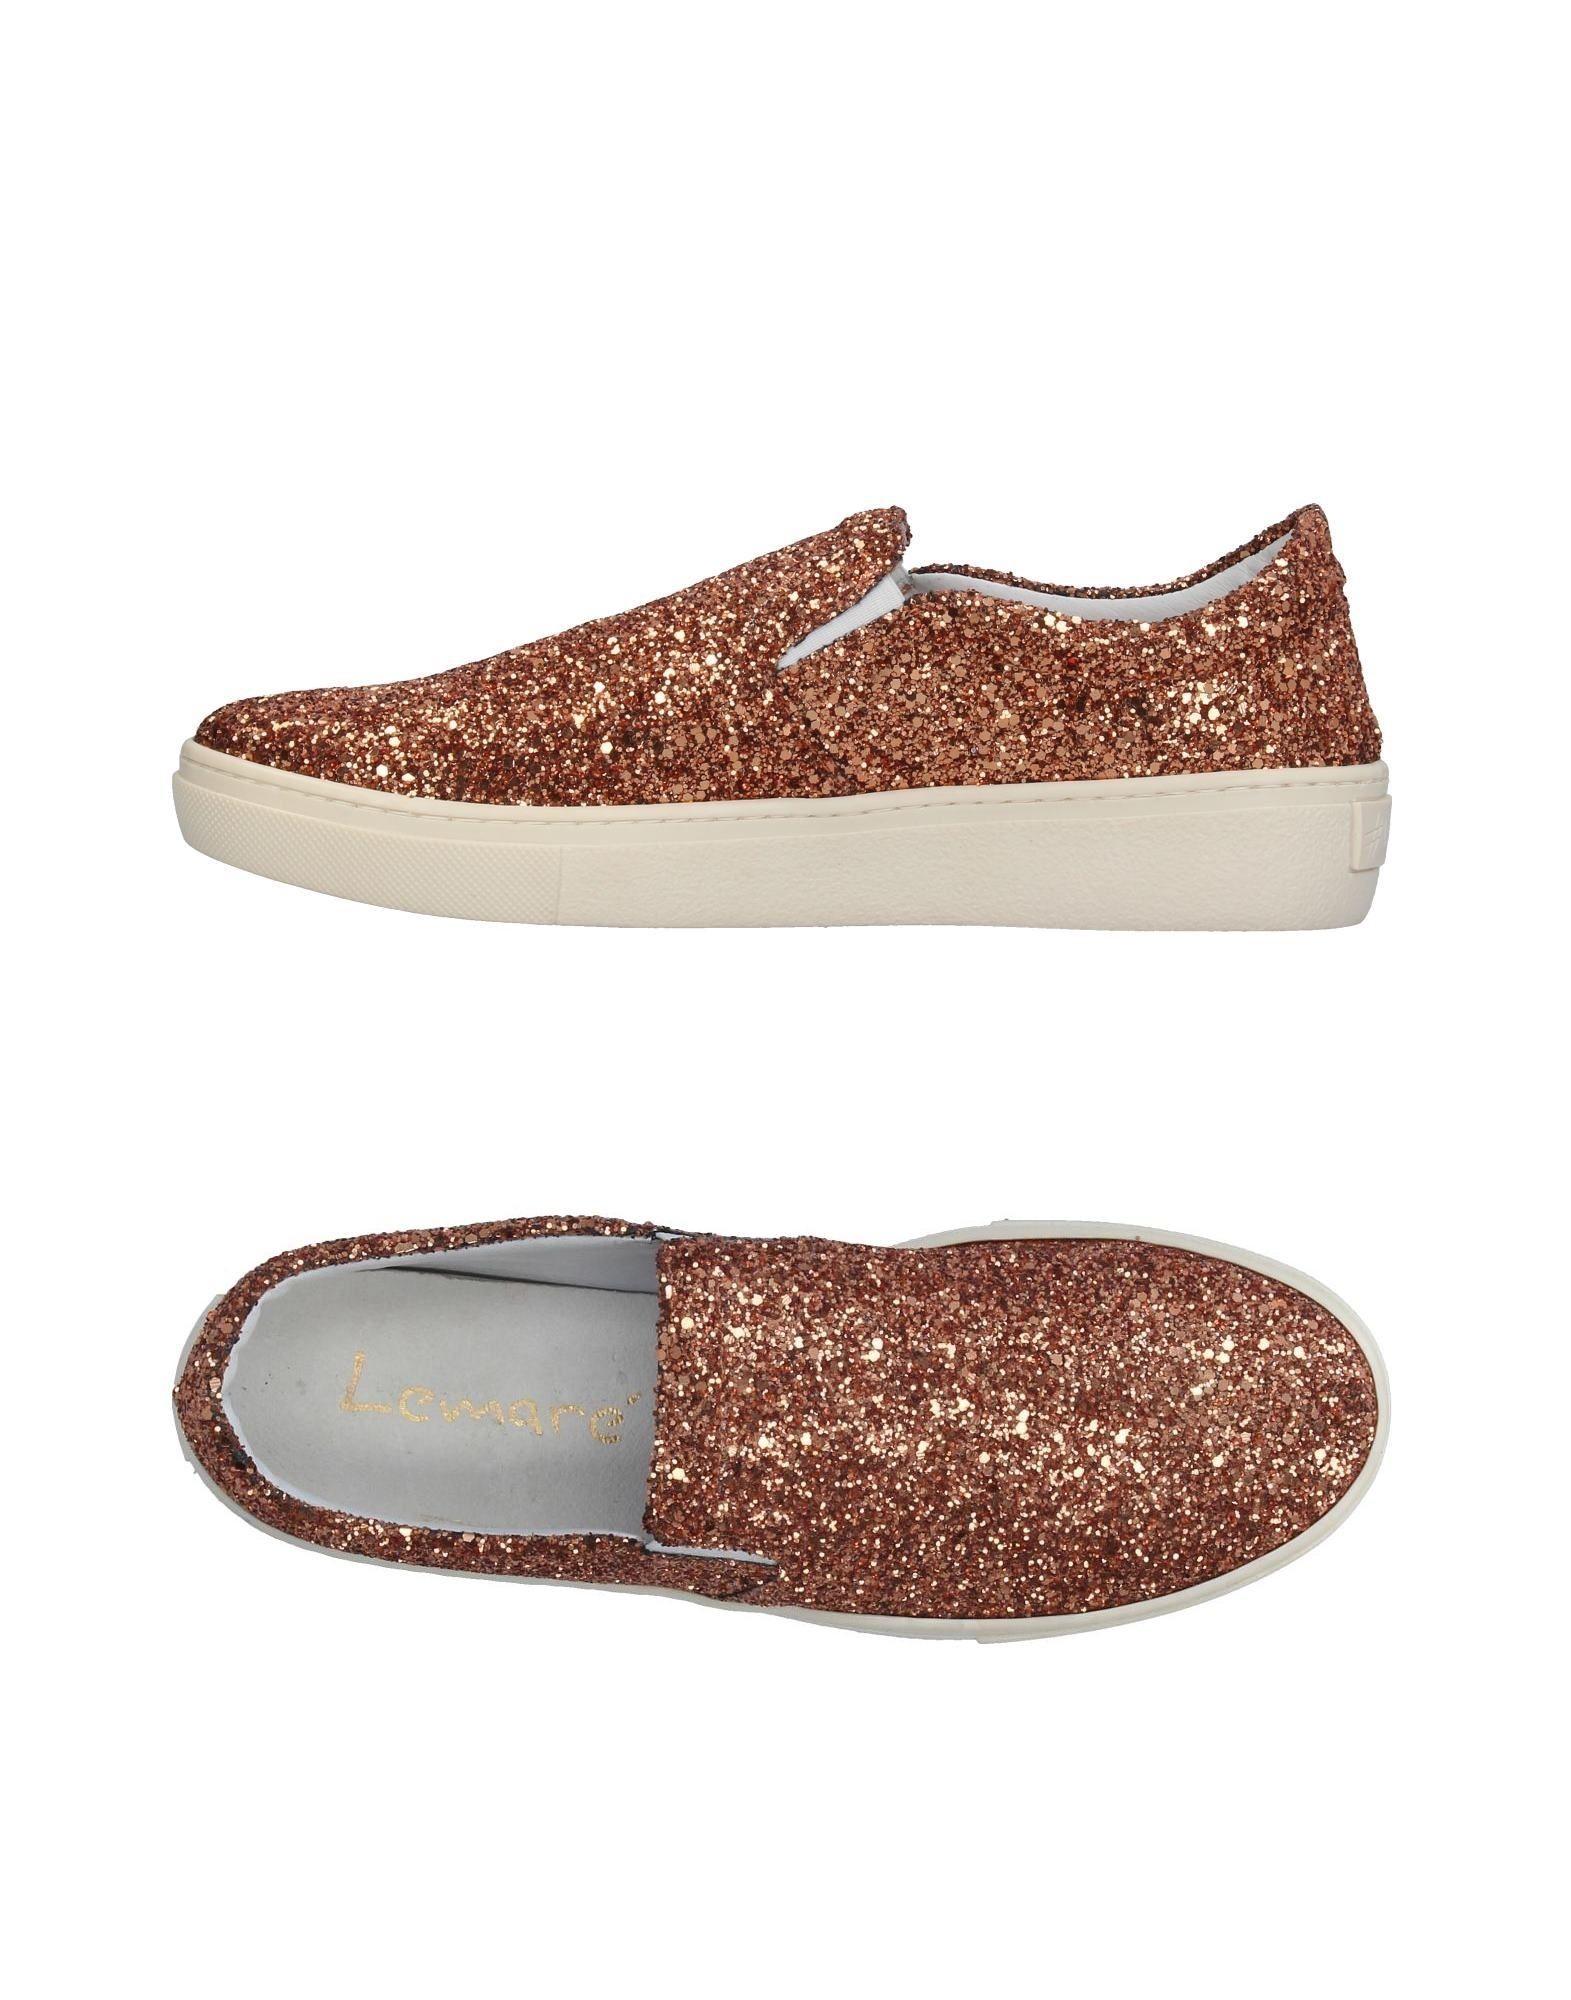 brooks низкие кеды и кроссовки LEMARÉ Низкие кеды и кроссовки